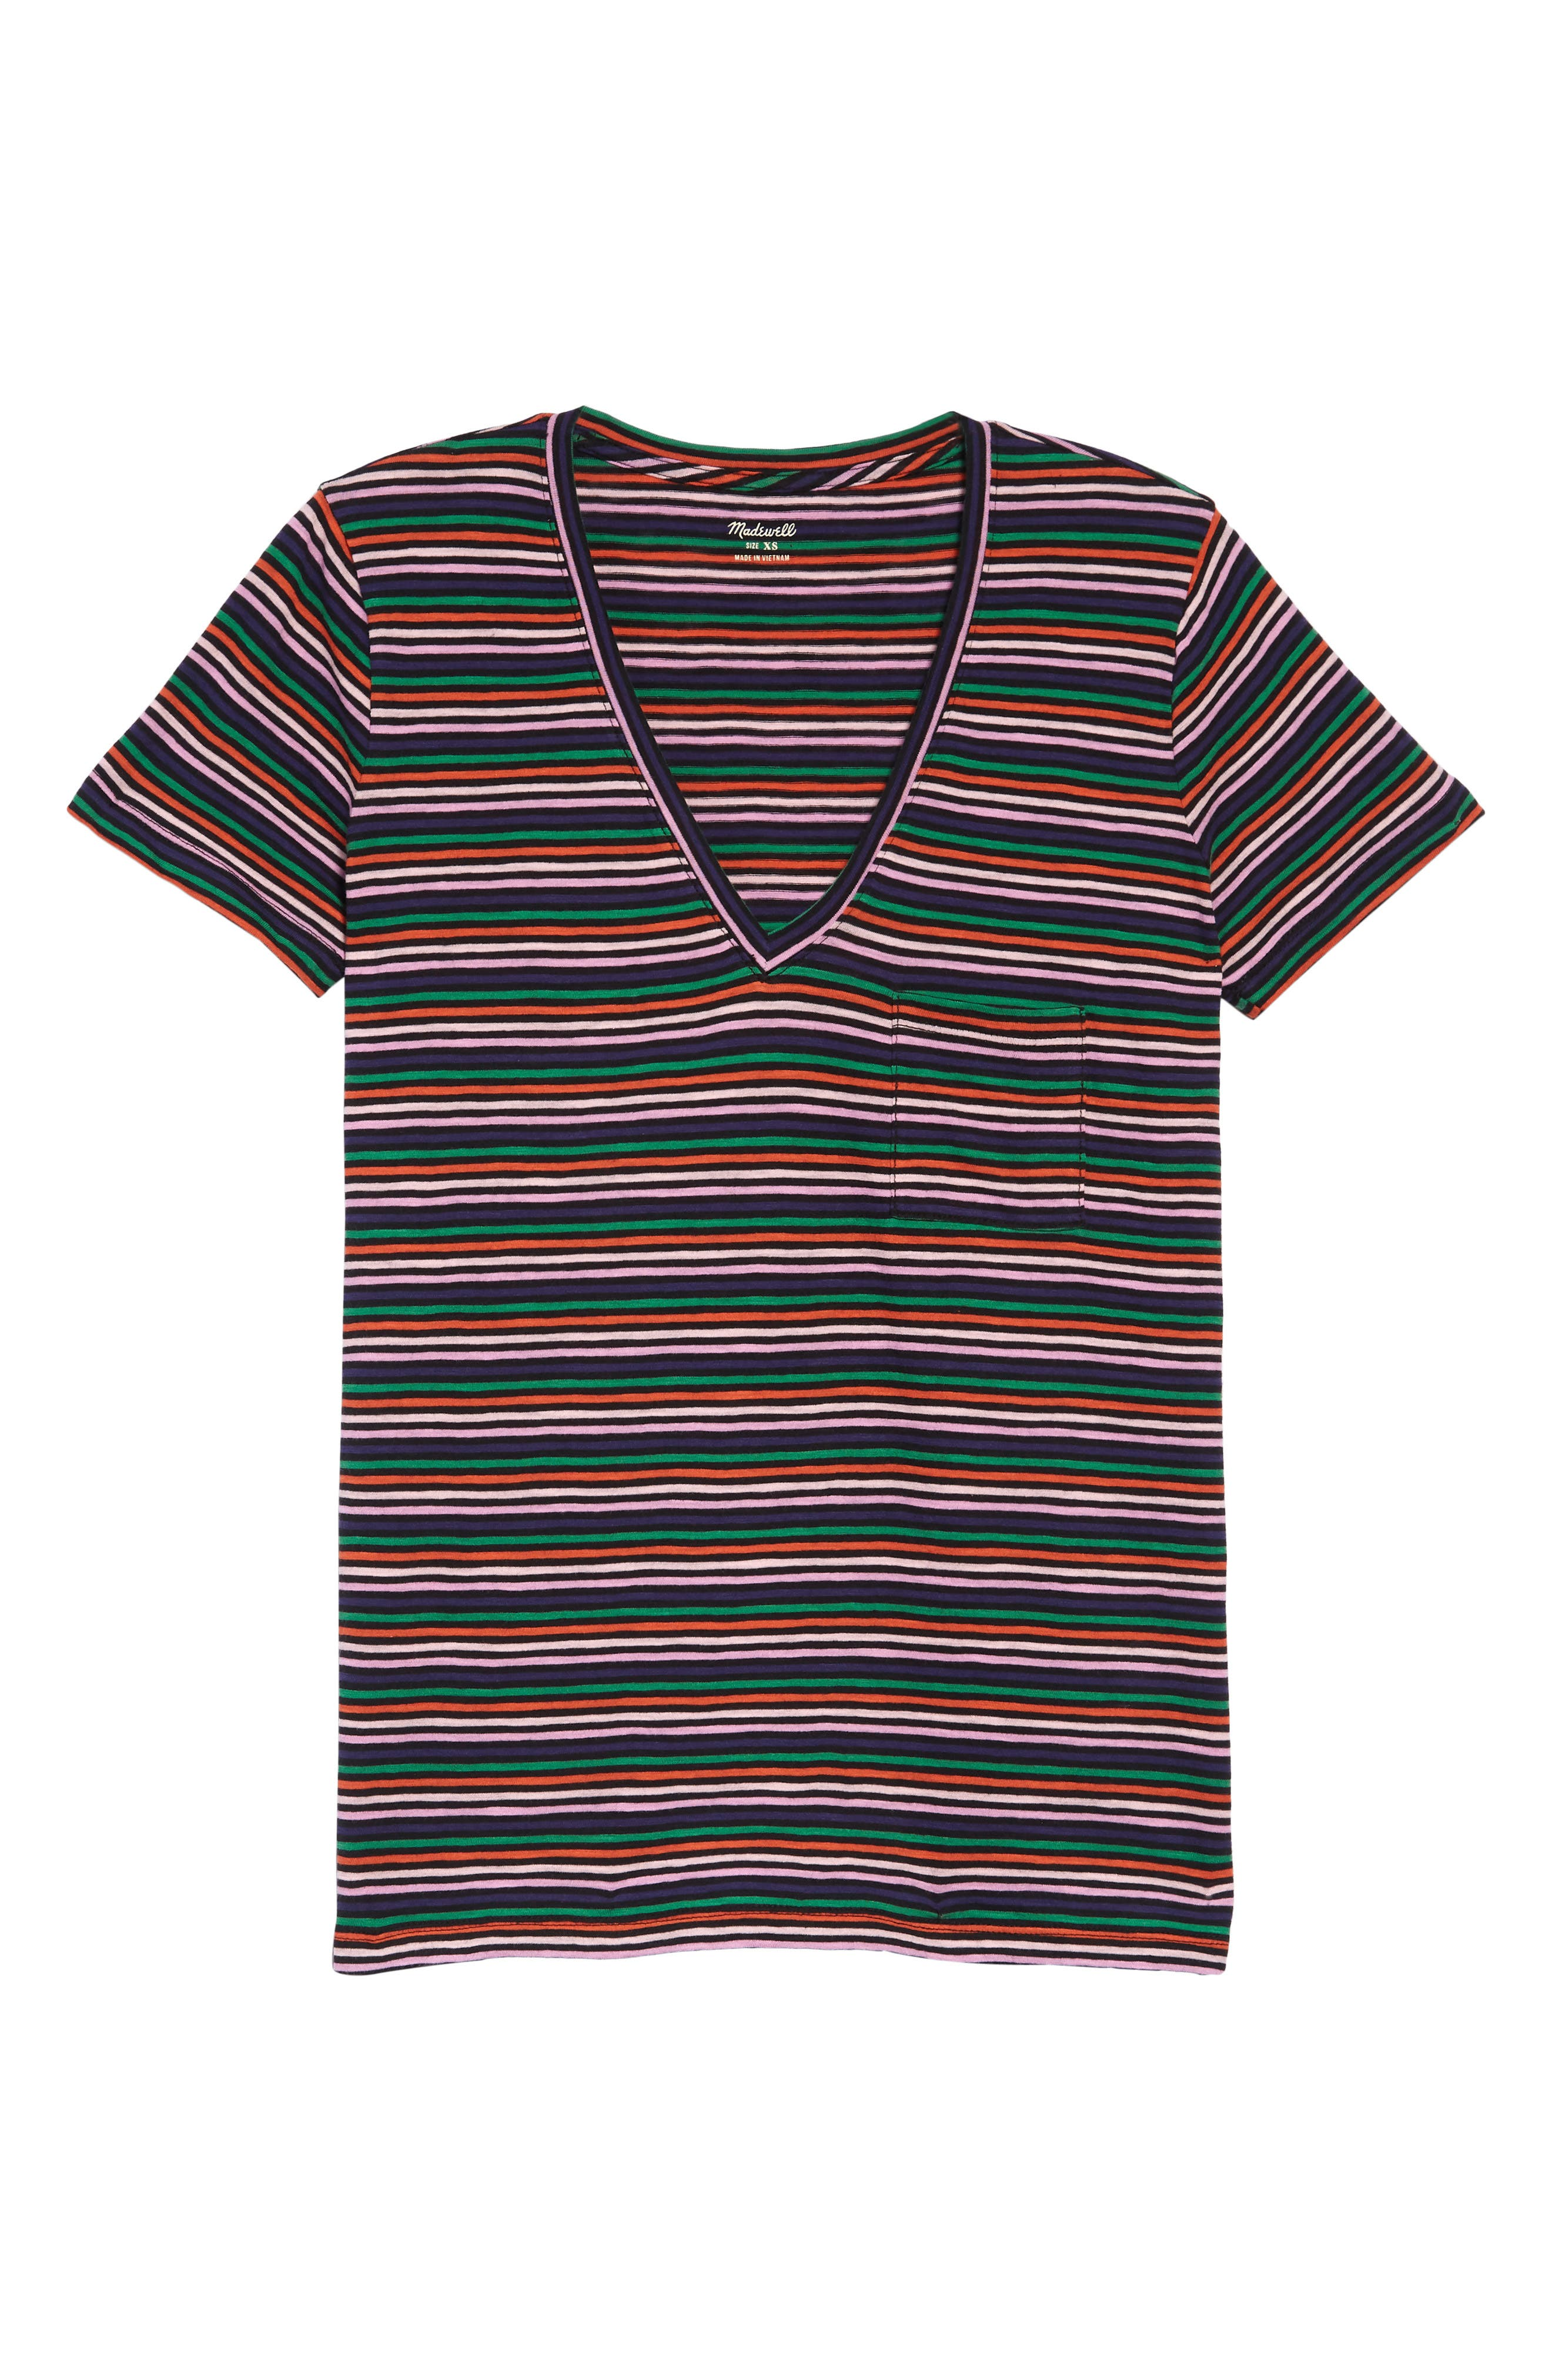 Whisper Cotton Stripe V-Neck Pocket Tee, Main, color, COASTAL RAINBOW NIAS STRIPE